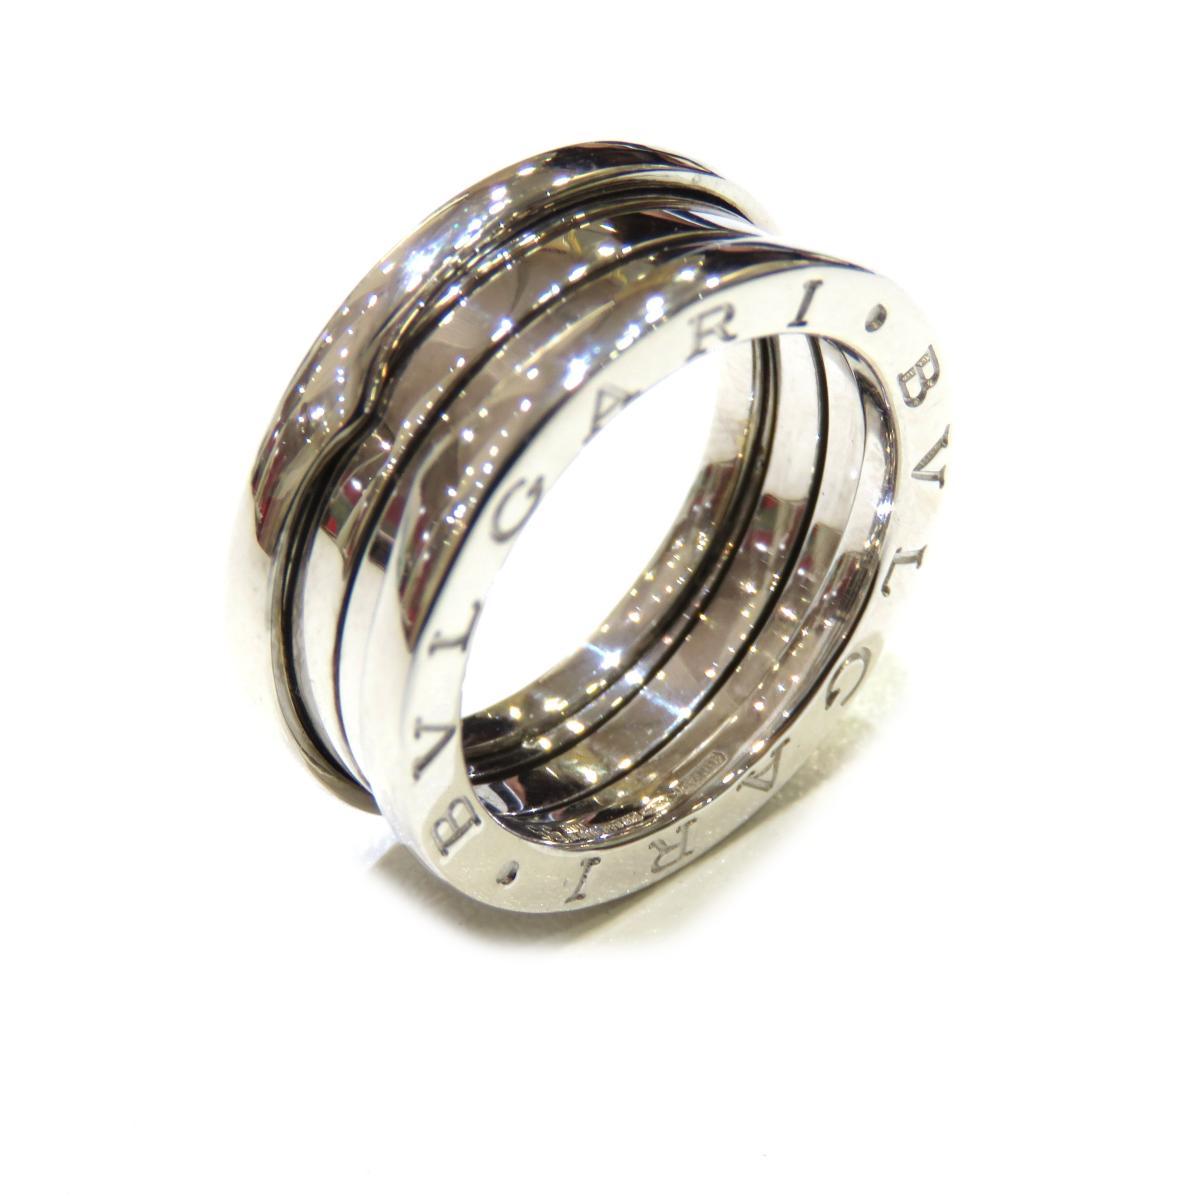 BVLGARI(ブルガリ)/B-zero1 リング S 指輪 セール/リング/シルバー系/K18WG(750)ホワイトゴールド/【ランクA】/#55/14号【中古】